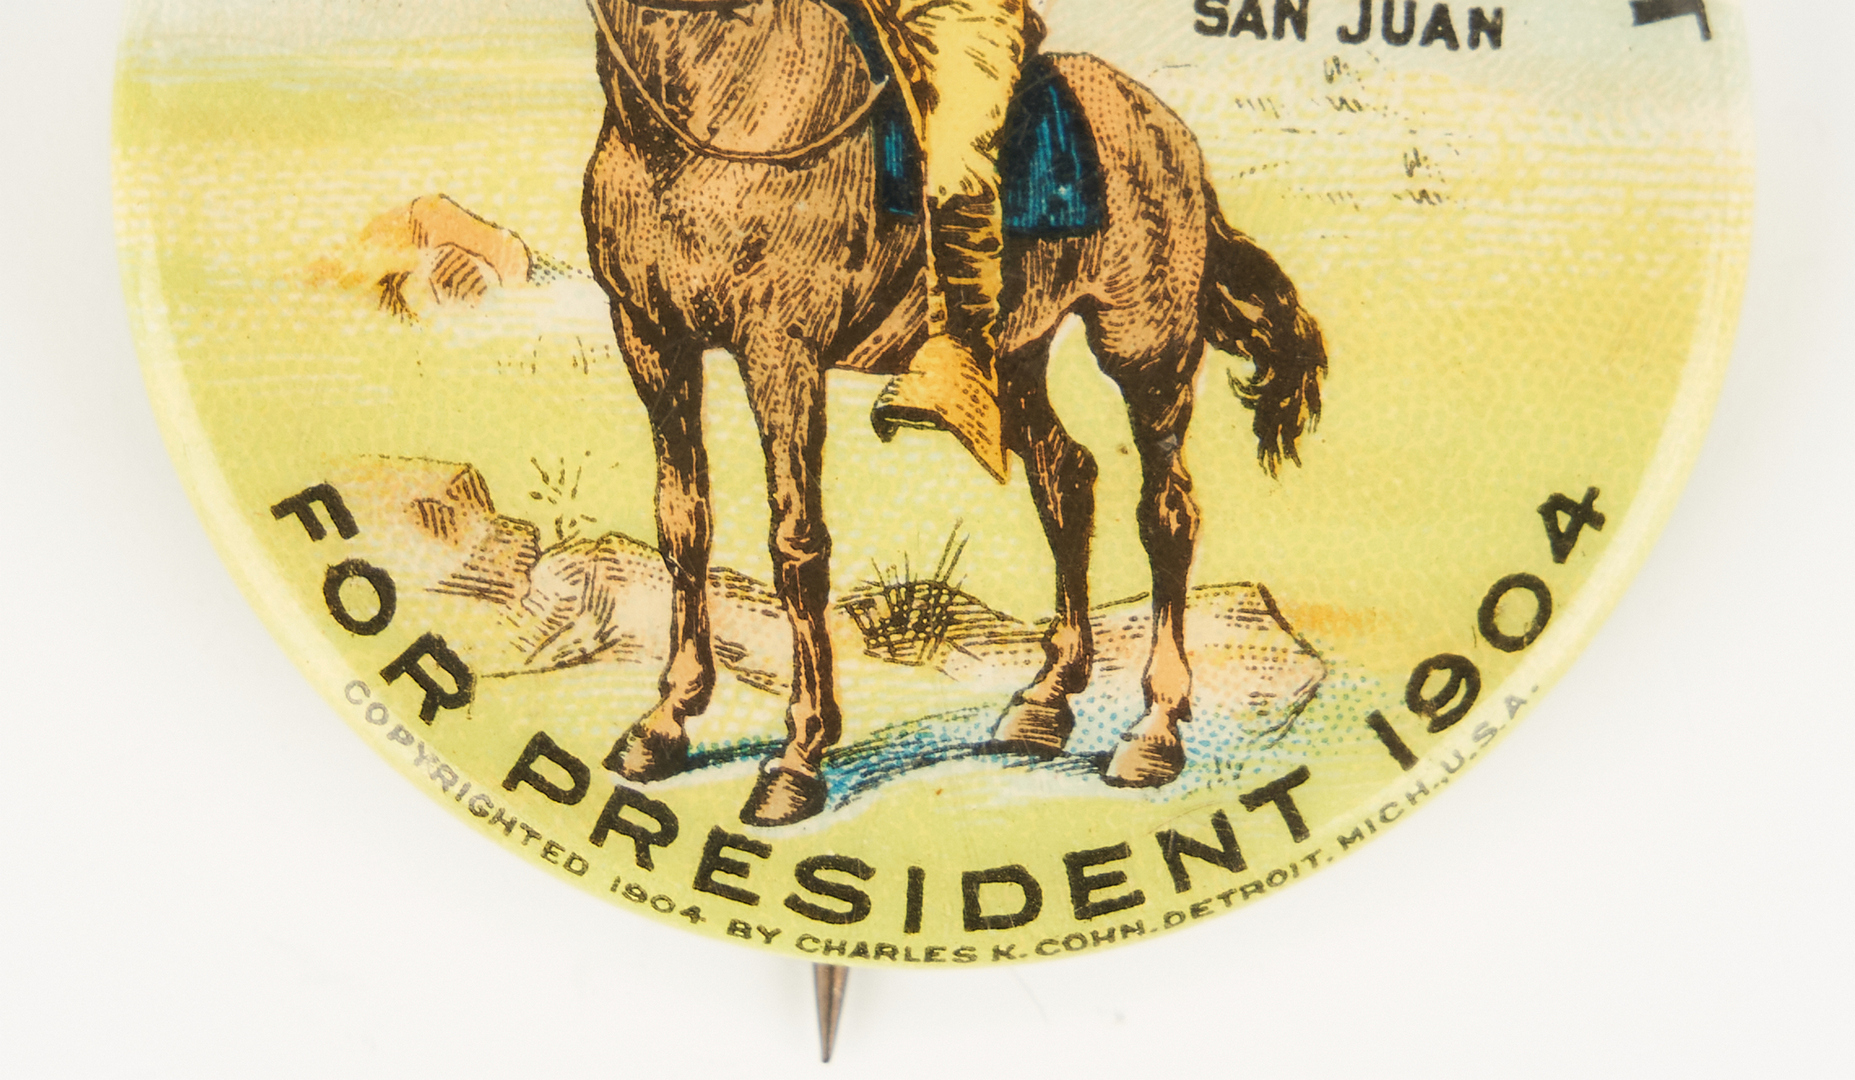 Lot 674: T. Roosevelt San Juan Hill Presidential Campaign Button, 1904